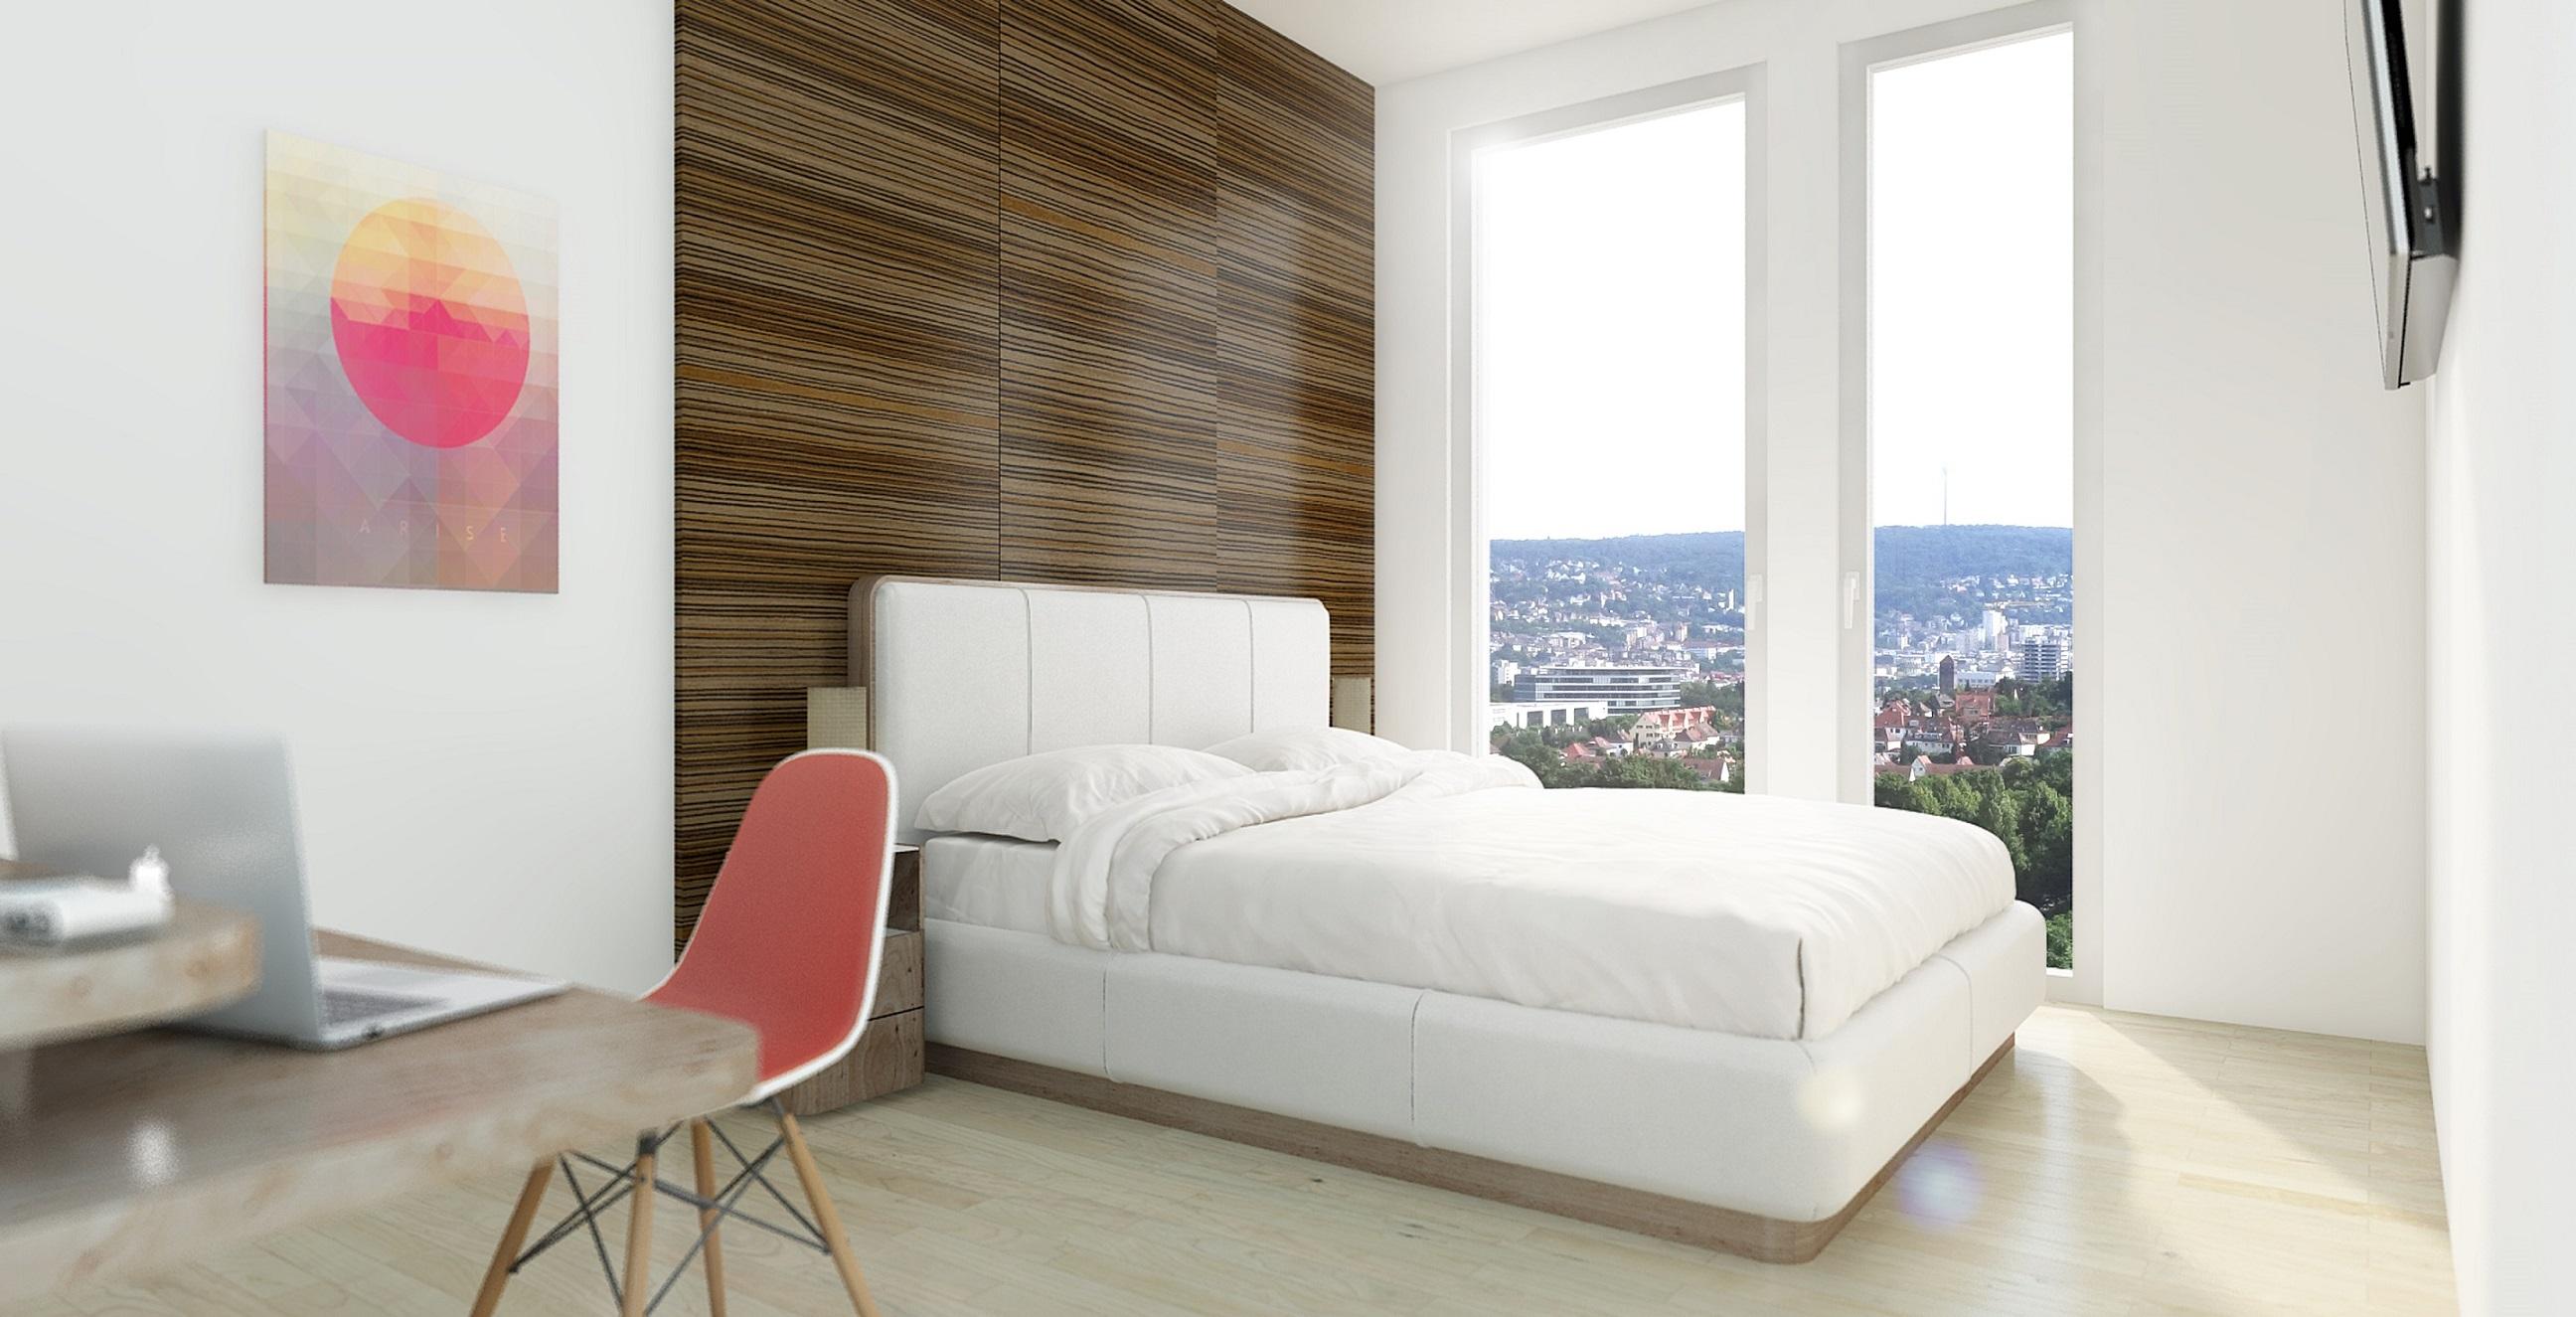 Sofa Stuttgart third novum hotel in stuttgart